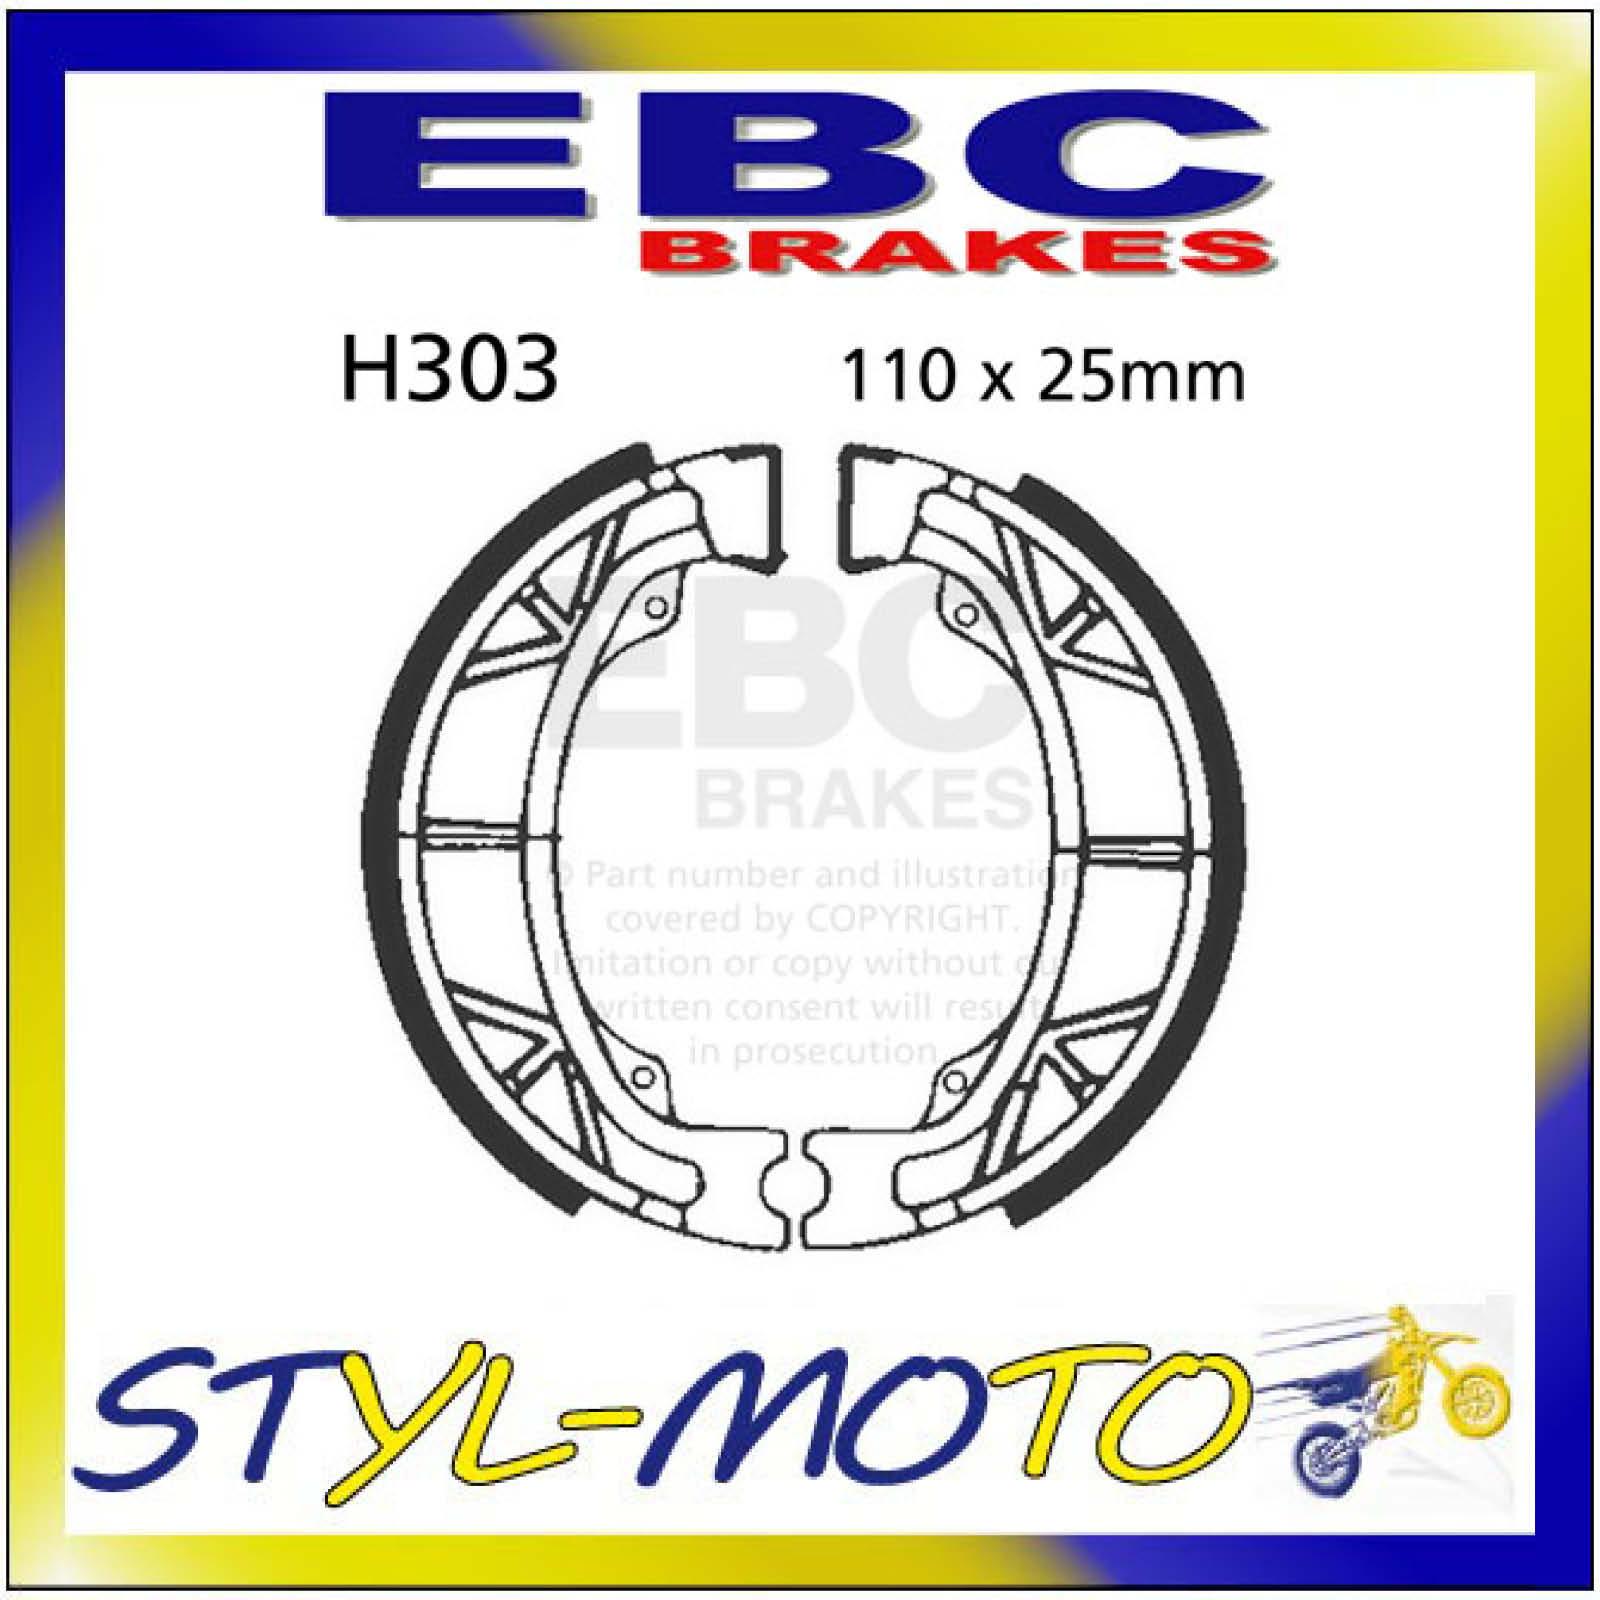 EBC GANASCE BRAKE SHOE h303 ANTERIORE POSTERIORE KYMCO MXER 150